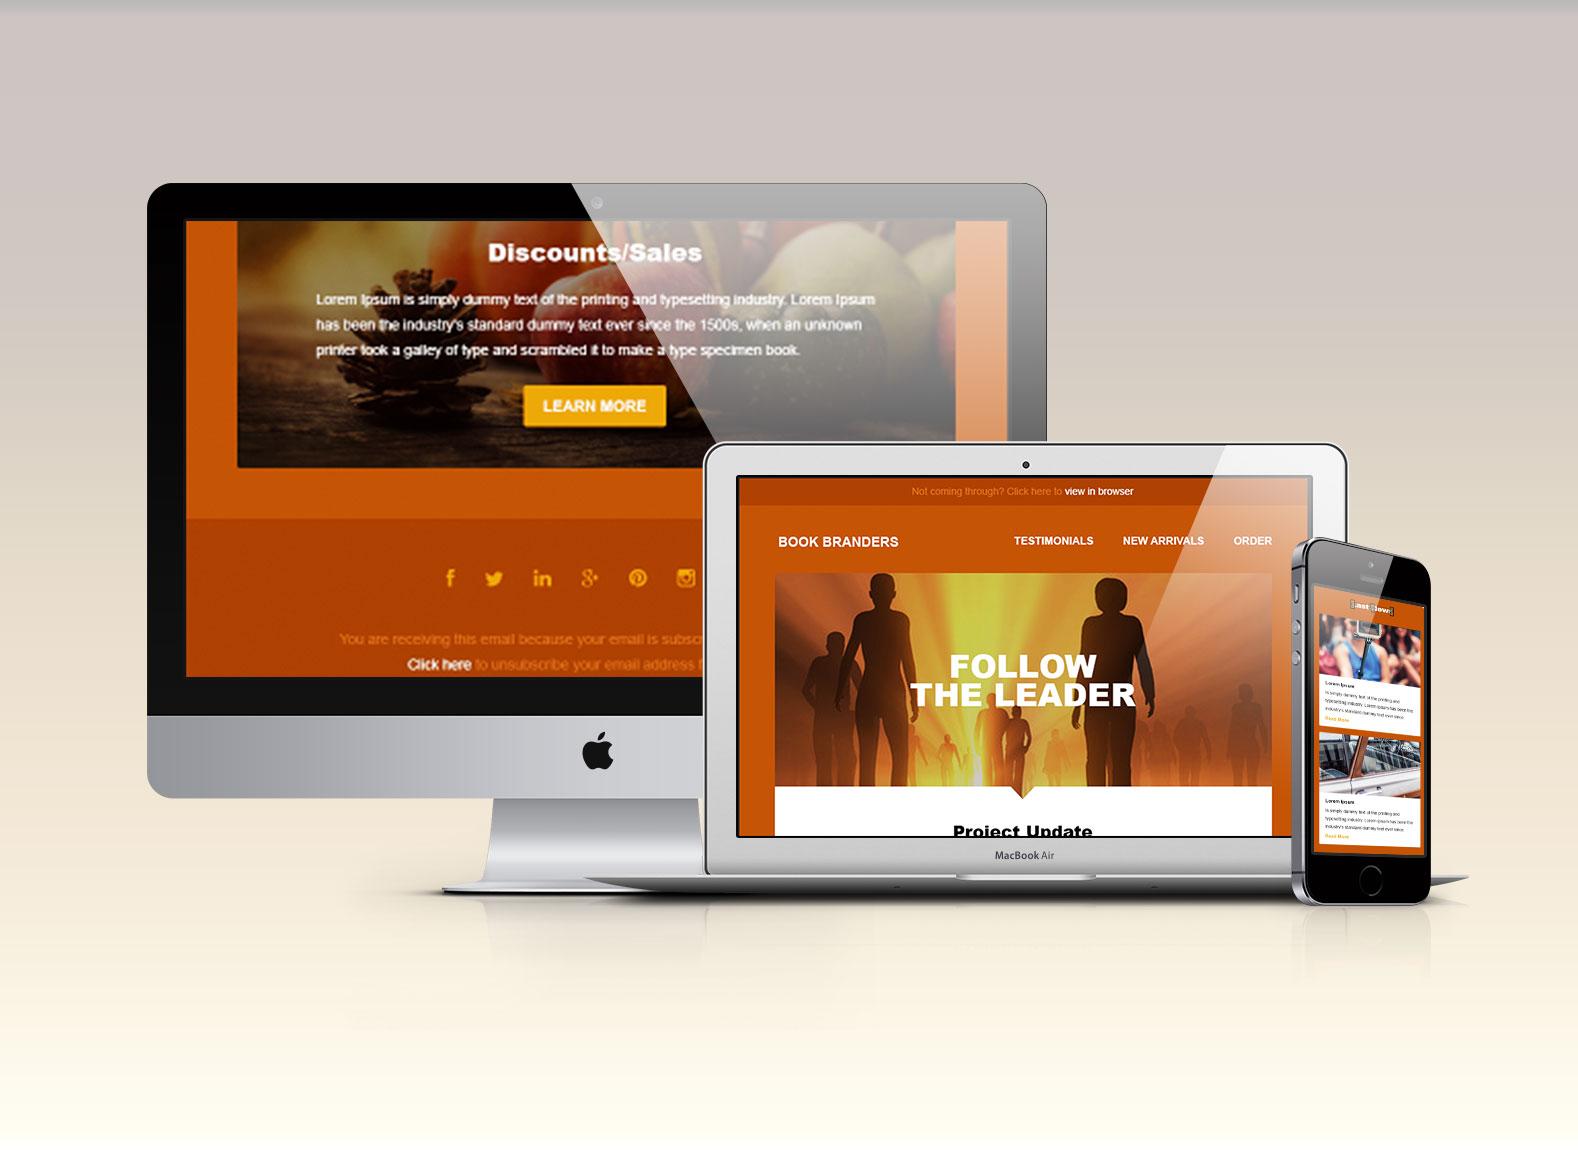 Book Branders Marketingnewsletterimg Marketing